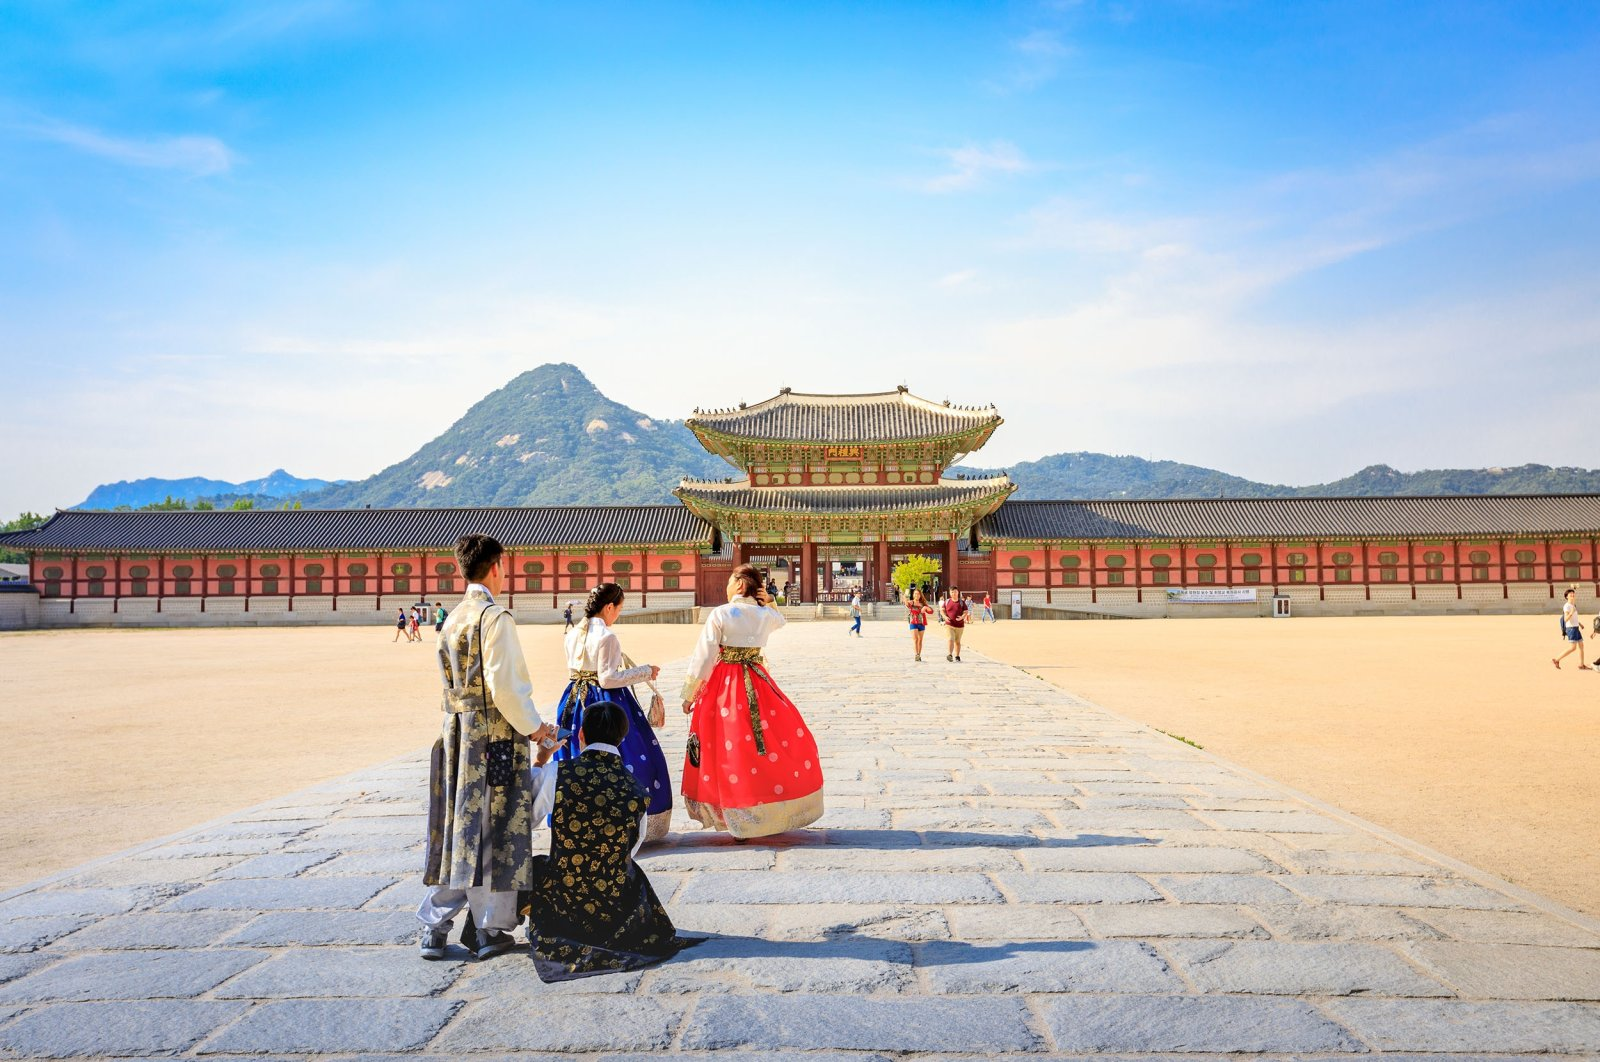 Tourists visiting Gyeongbokgung Palace in Seoul, South Korea, June 19, 2017. (Shutterstock Photo)